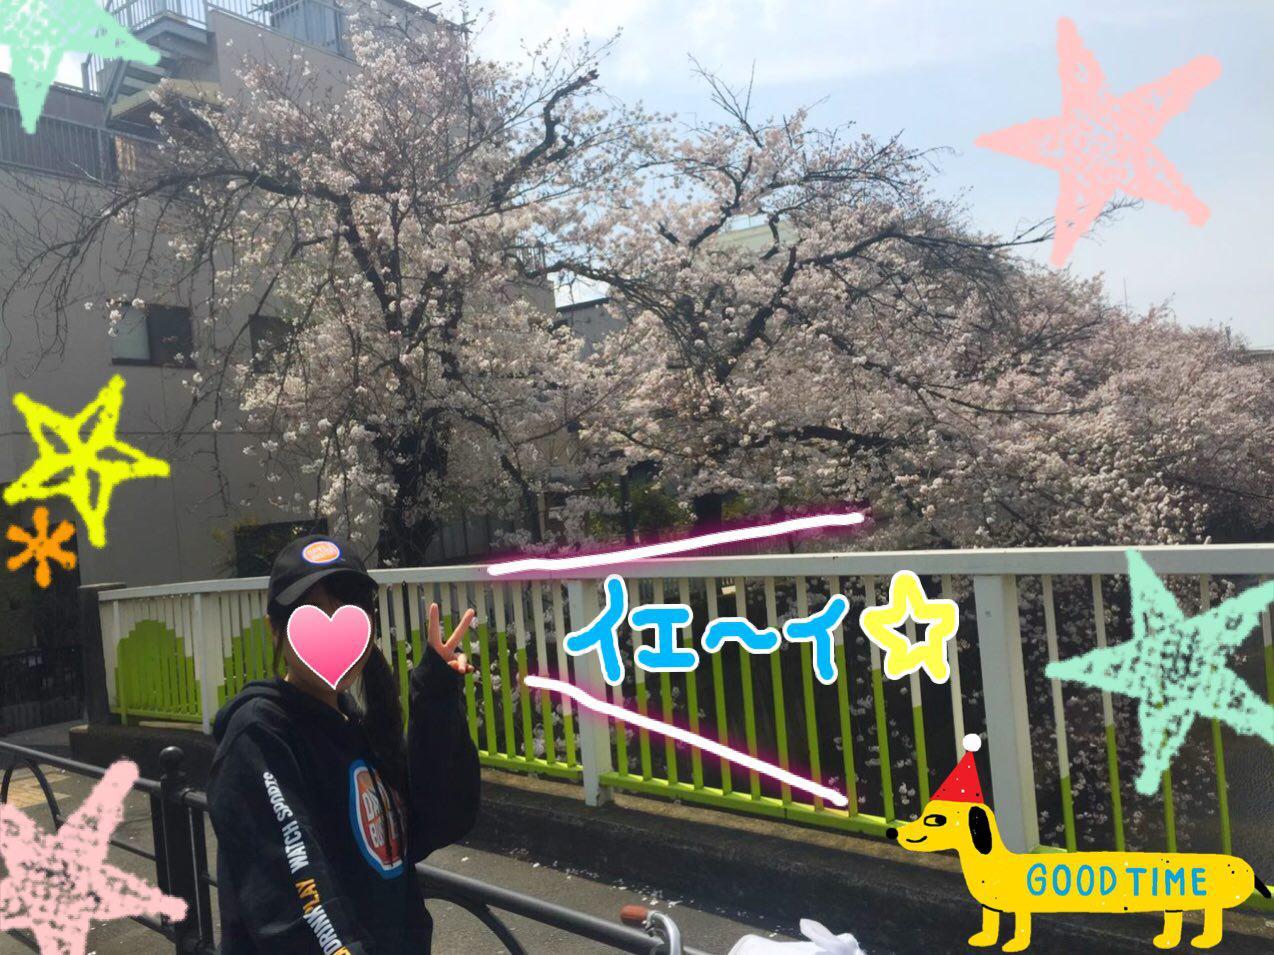 photo_2017-04-06_22-49-54.jpg